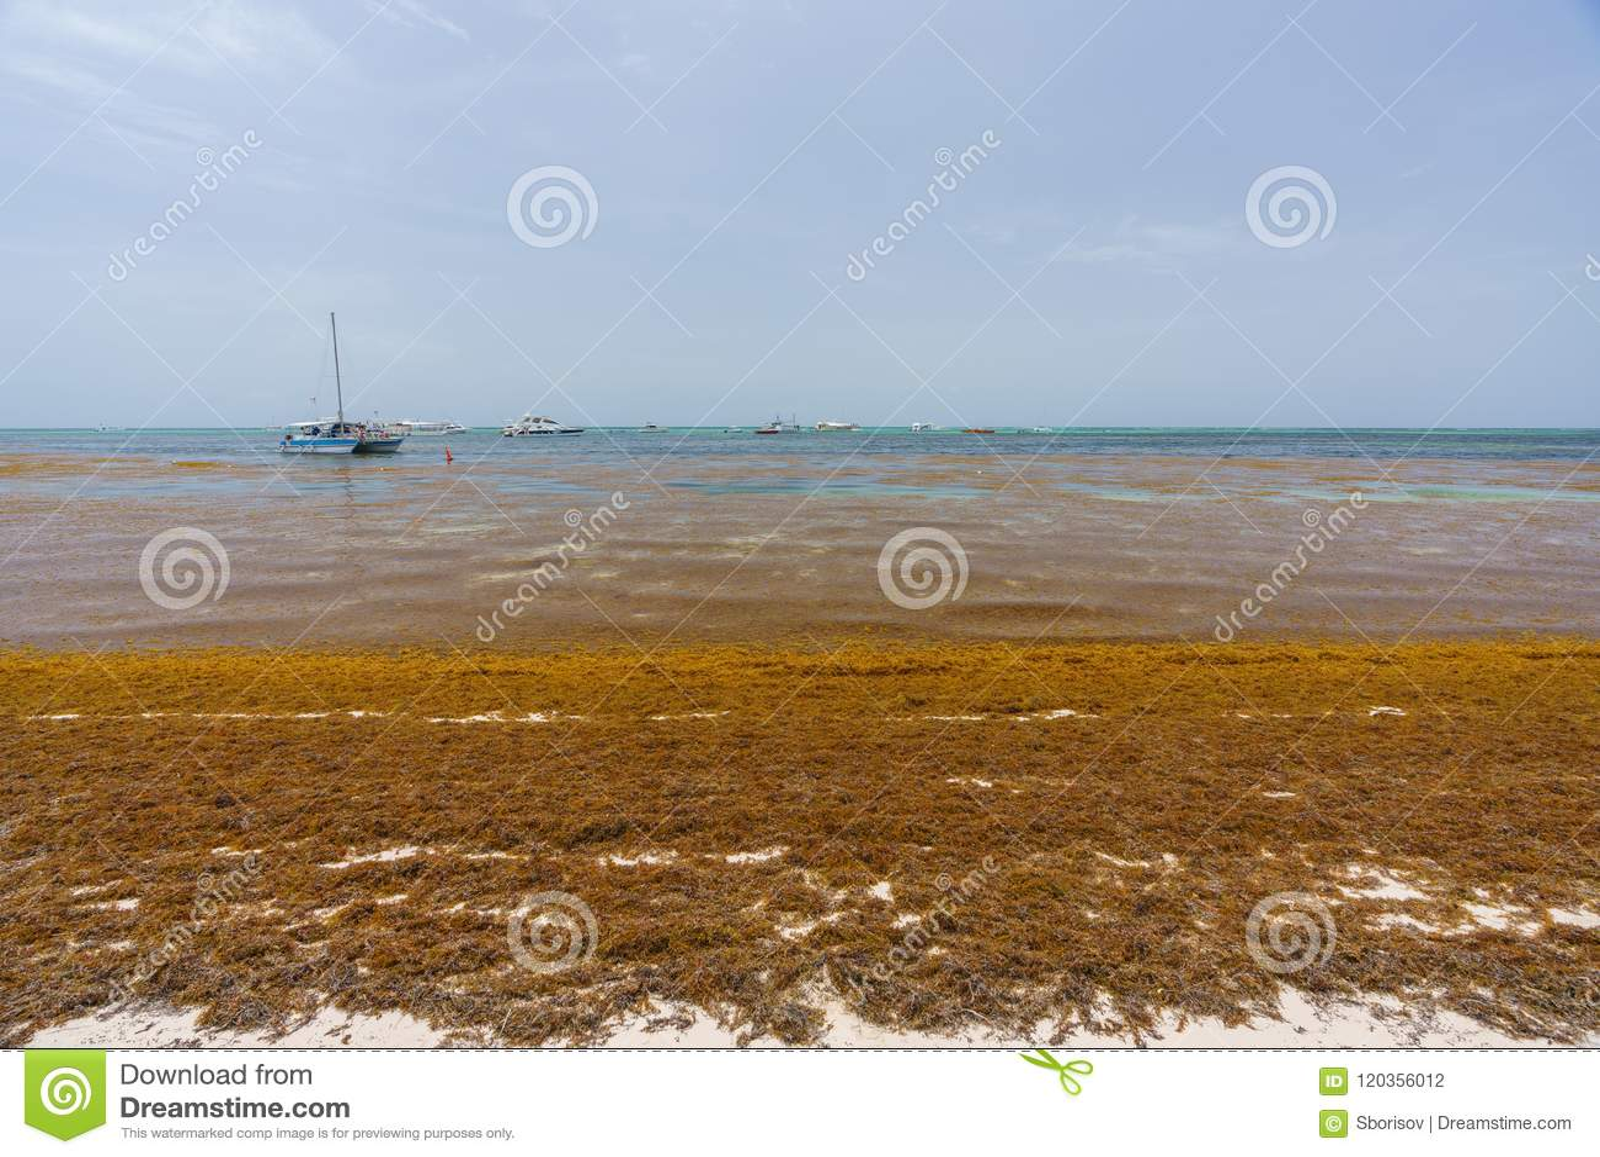 Punta Cana, Dominican Republic - June 24, 2018: Sargassum